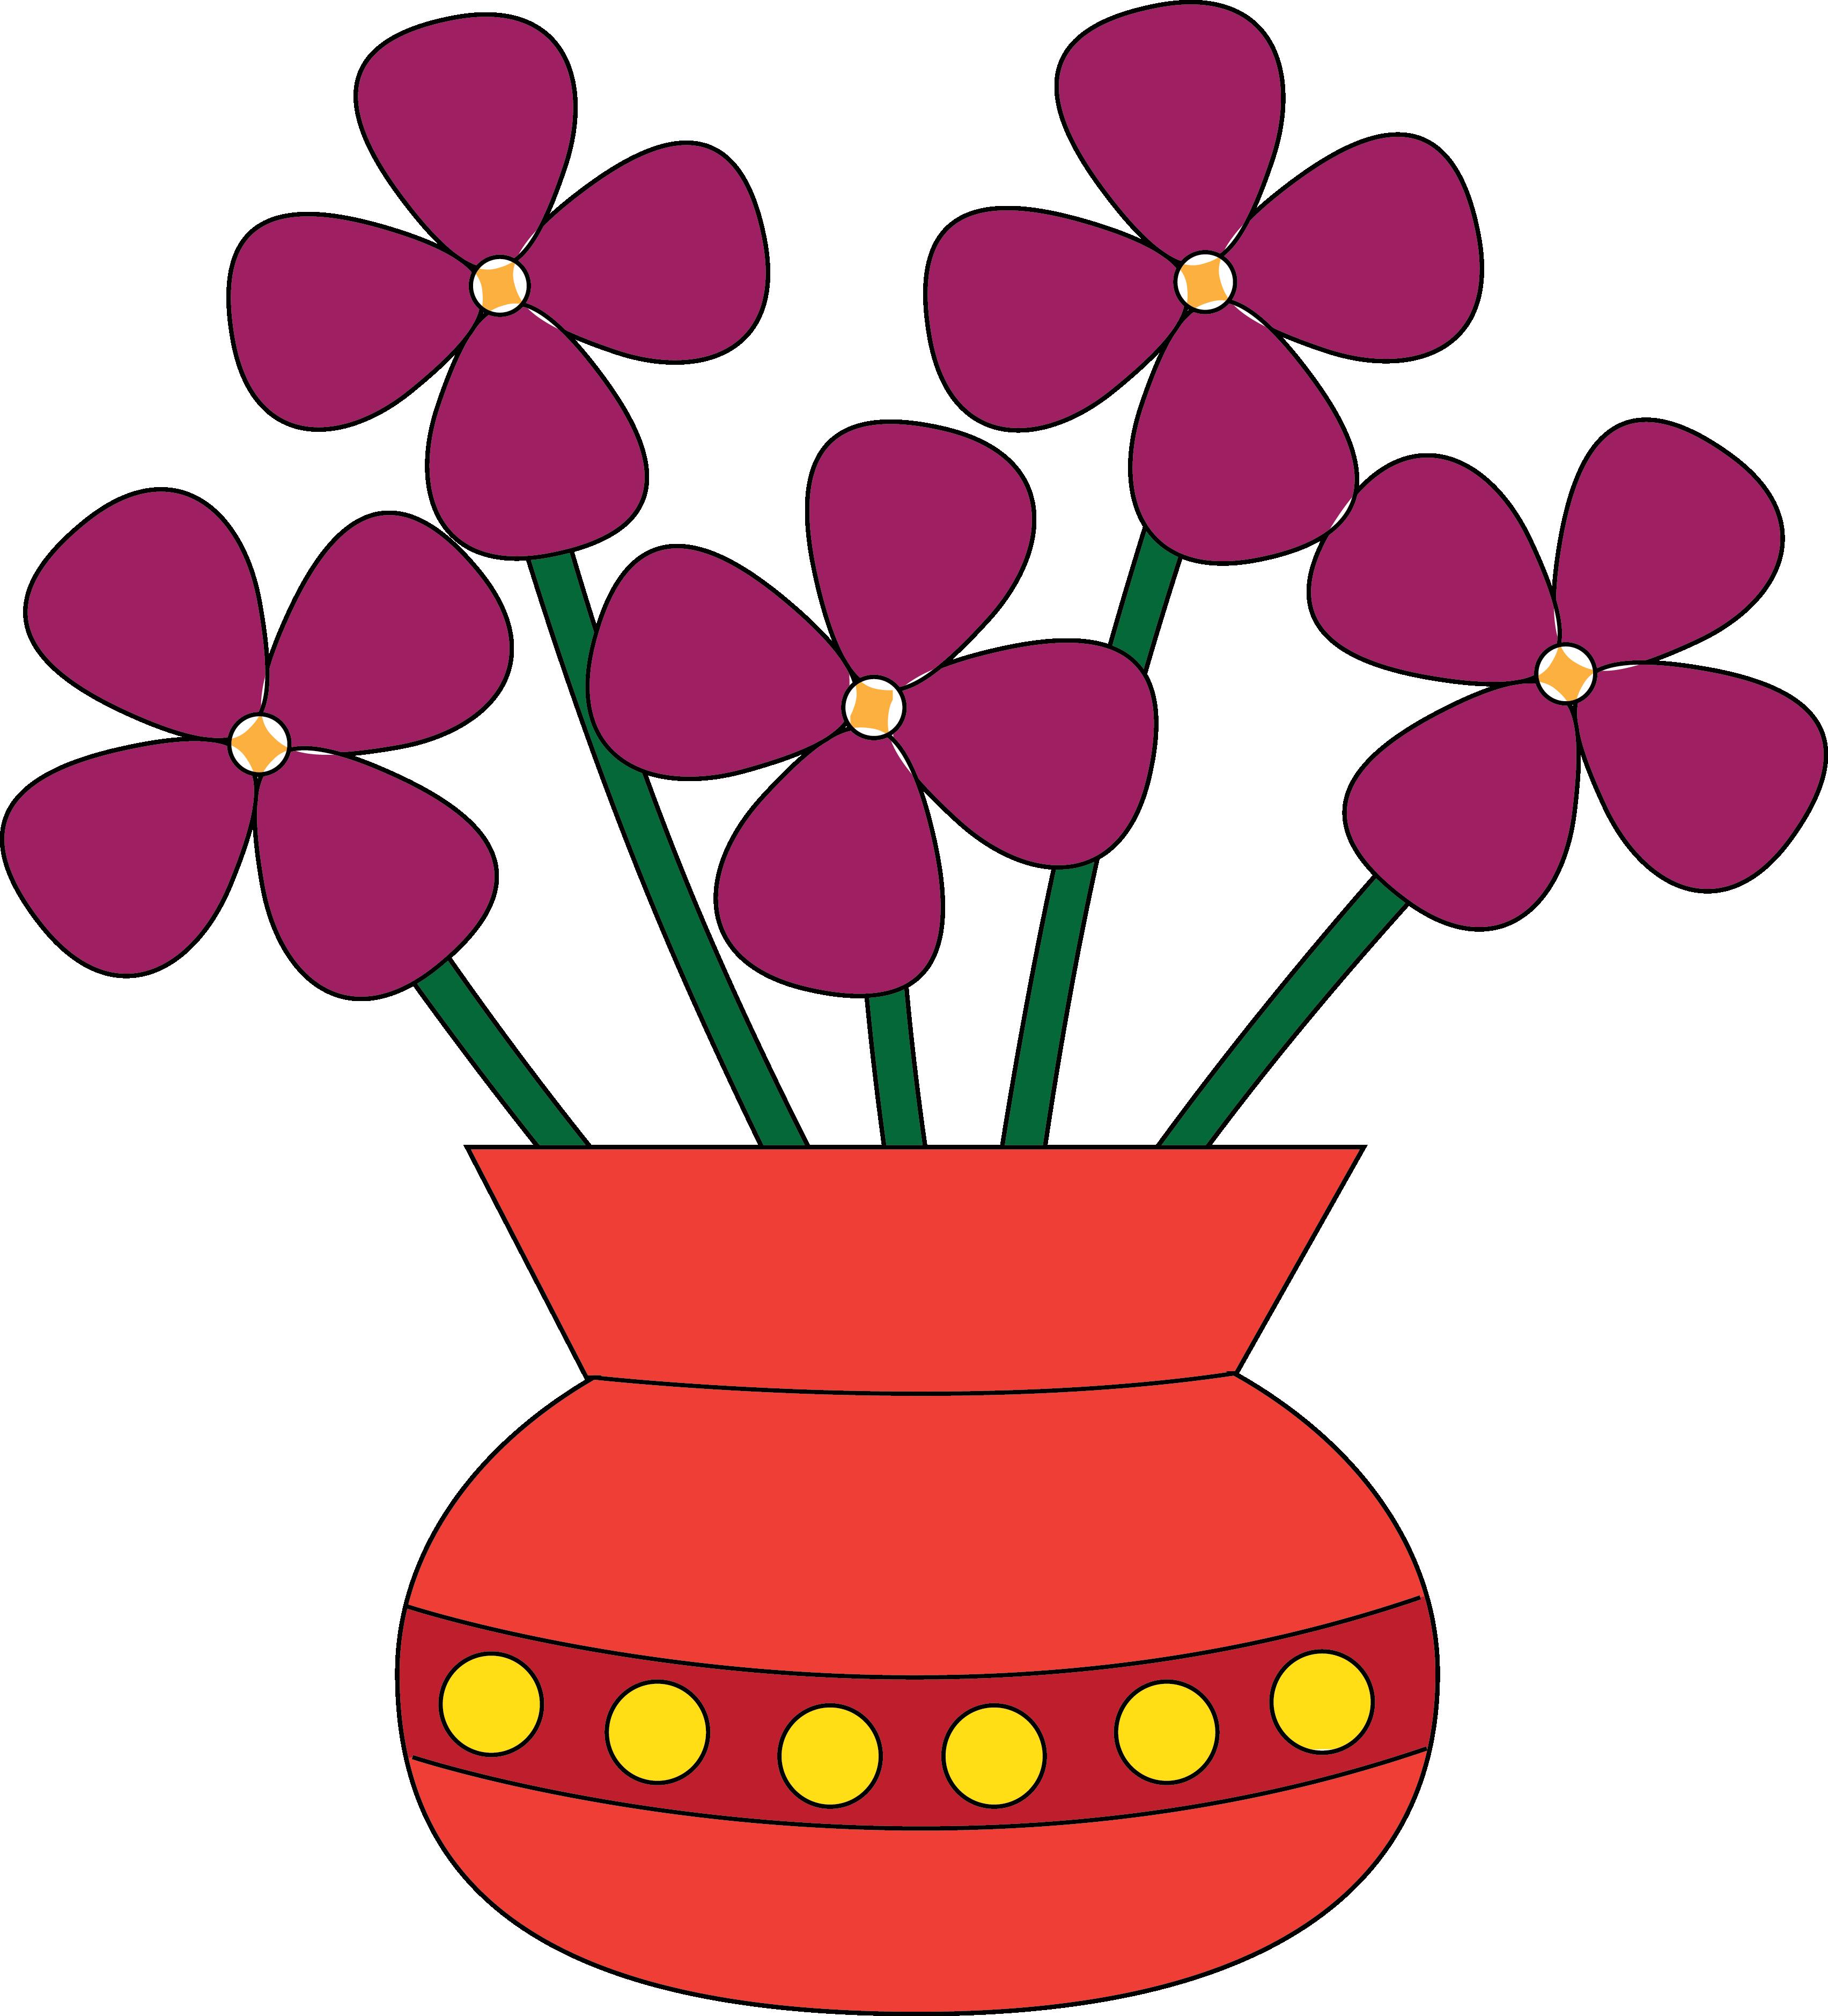 3408x3758 Clip Art Of 3 Vases Clipart